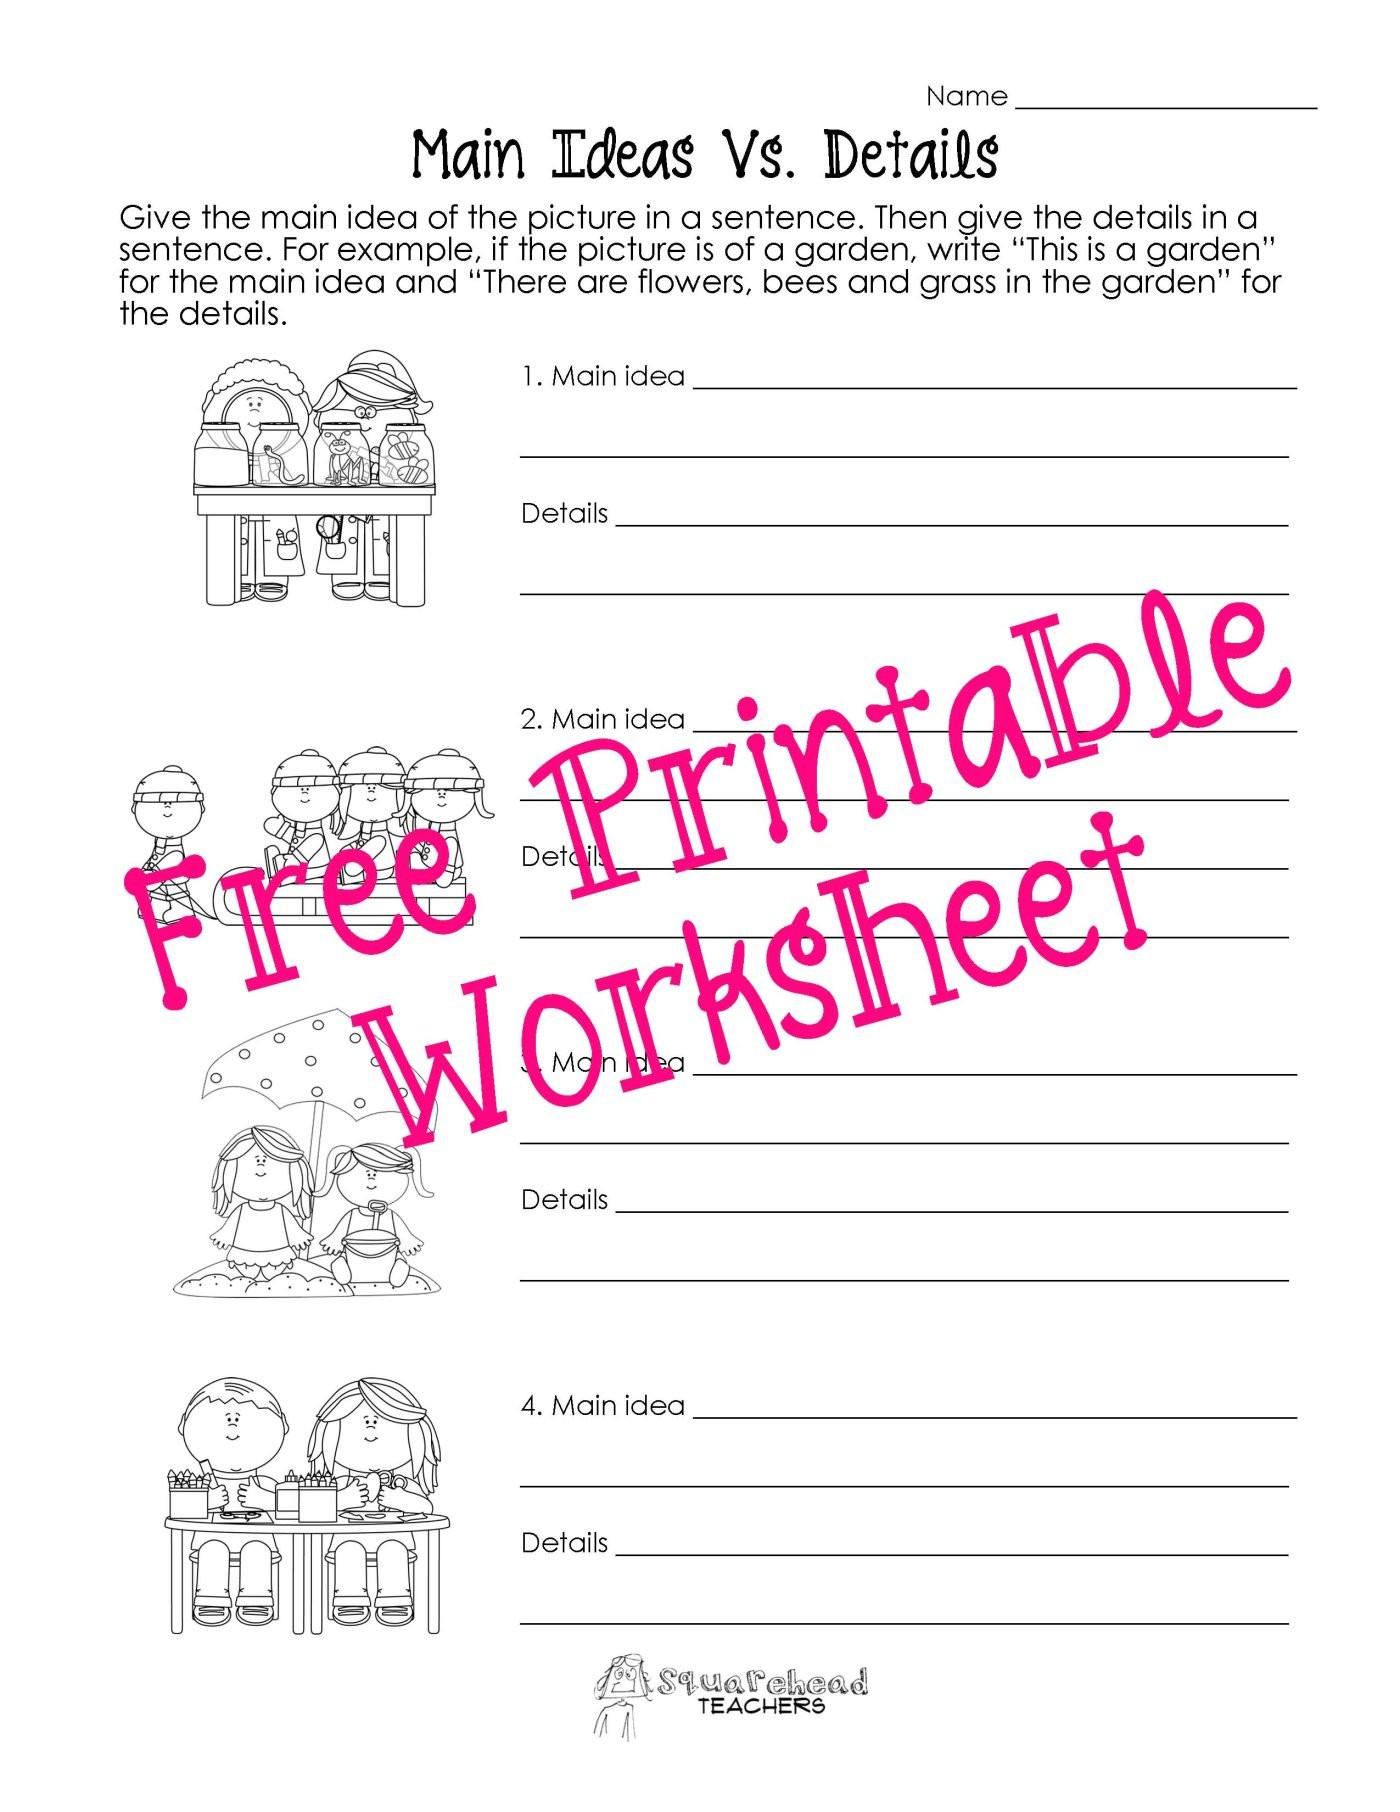 Main Idea Worksheet 4th Grade Main Idea Worksheets 5th Grade for Print Math Worksheet On